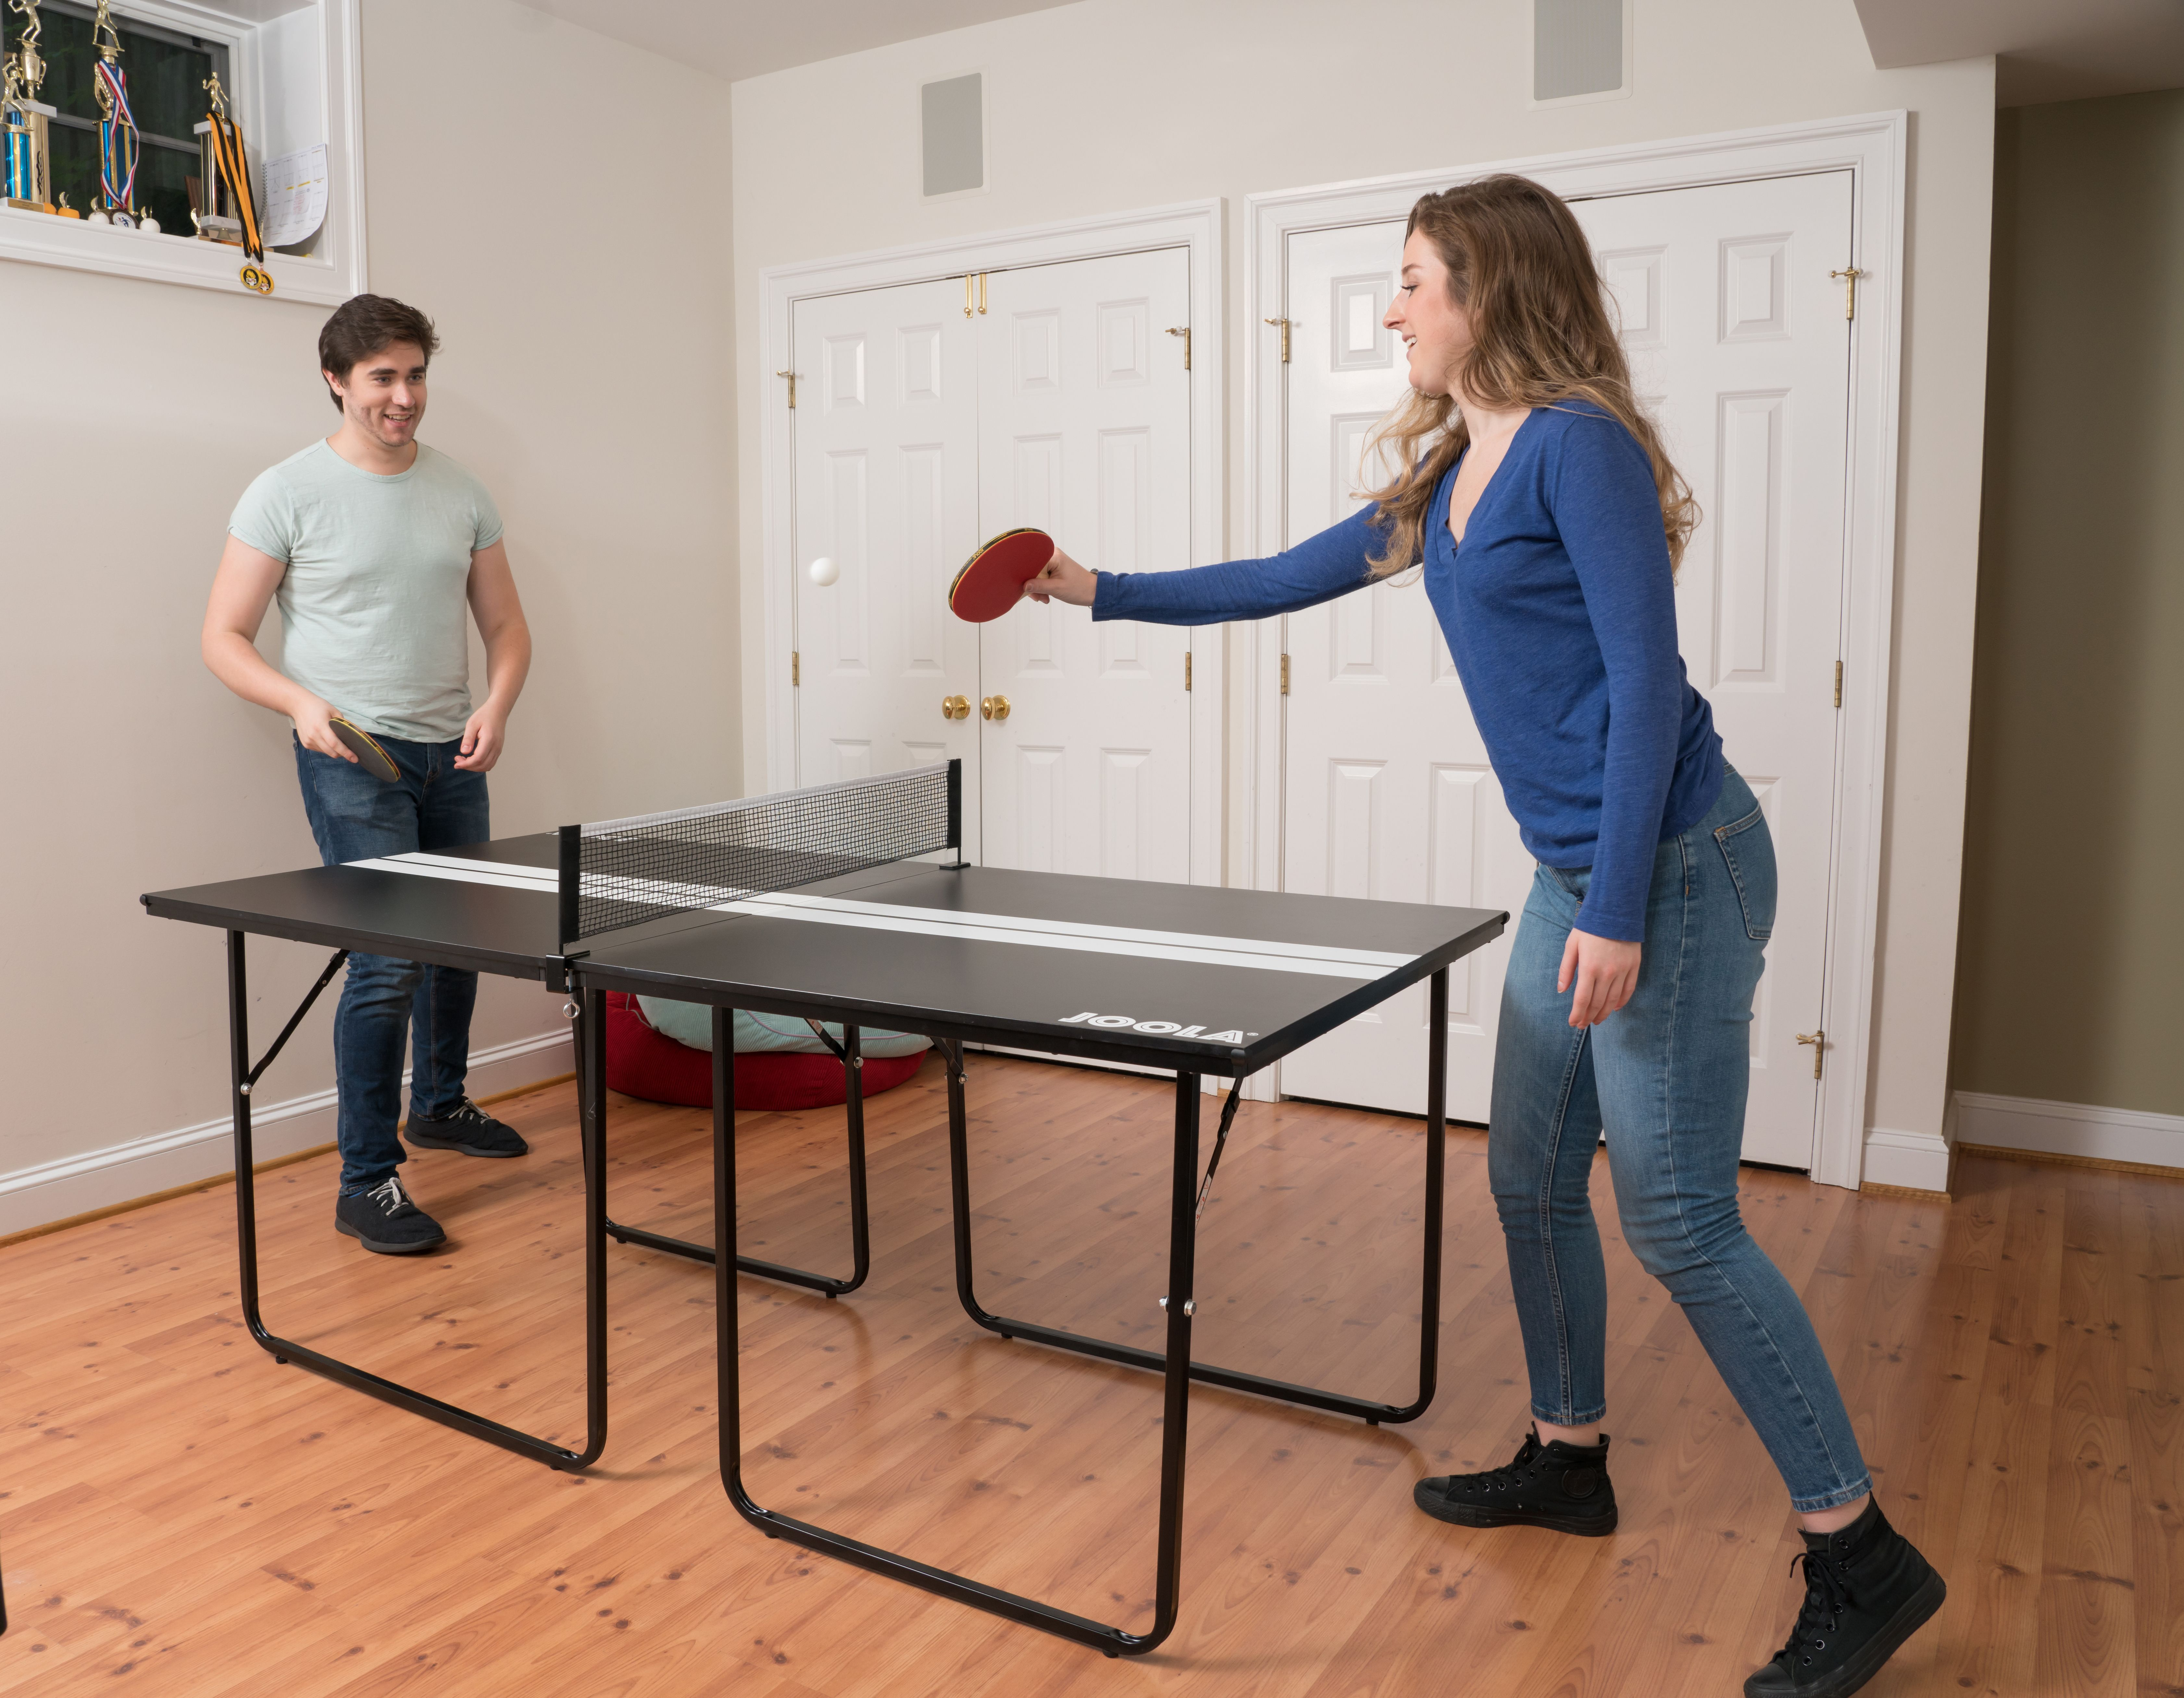 Joola Midsize Sport Table Tennis Table Joola Table Tennis Table Tennis Board Table